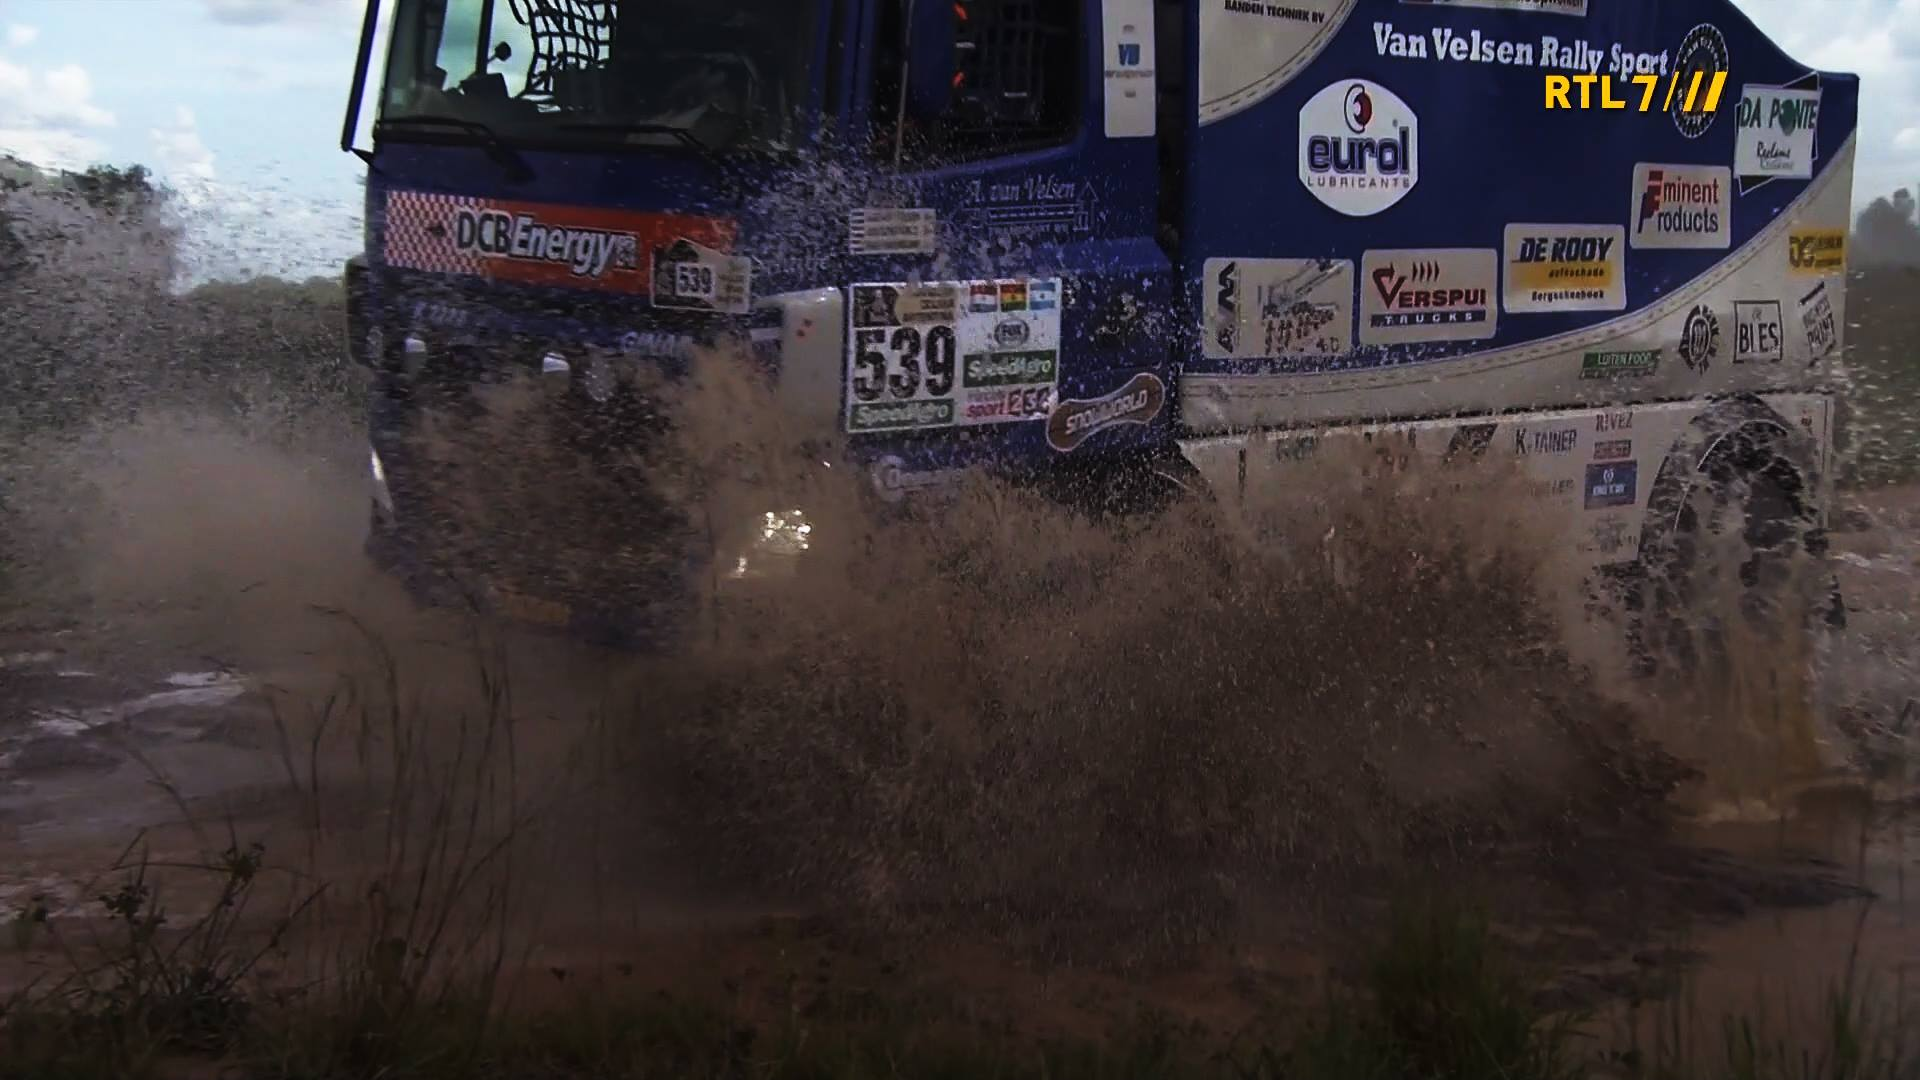 Van Velsen Rally sport: Etappe 7: het ging super!